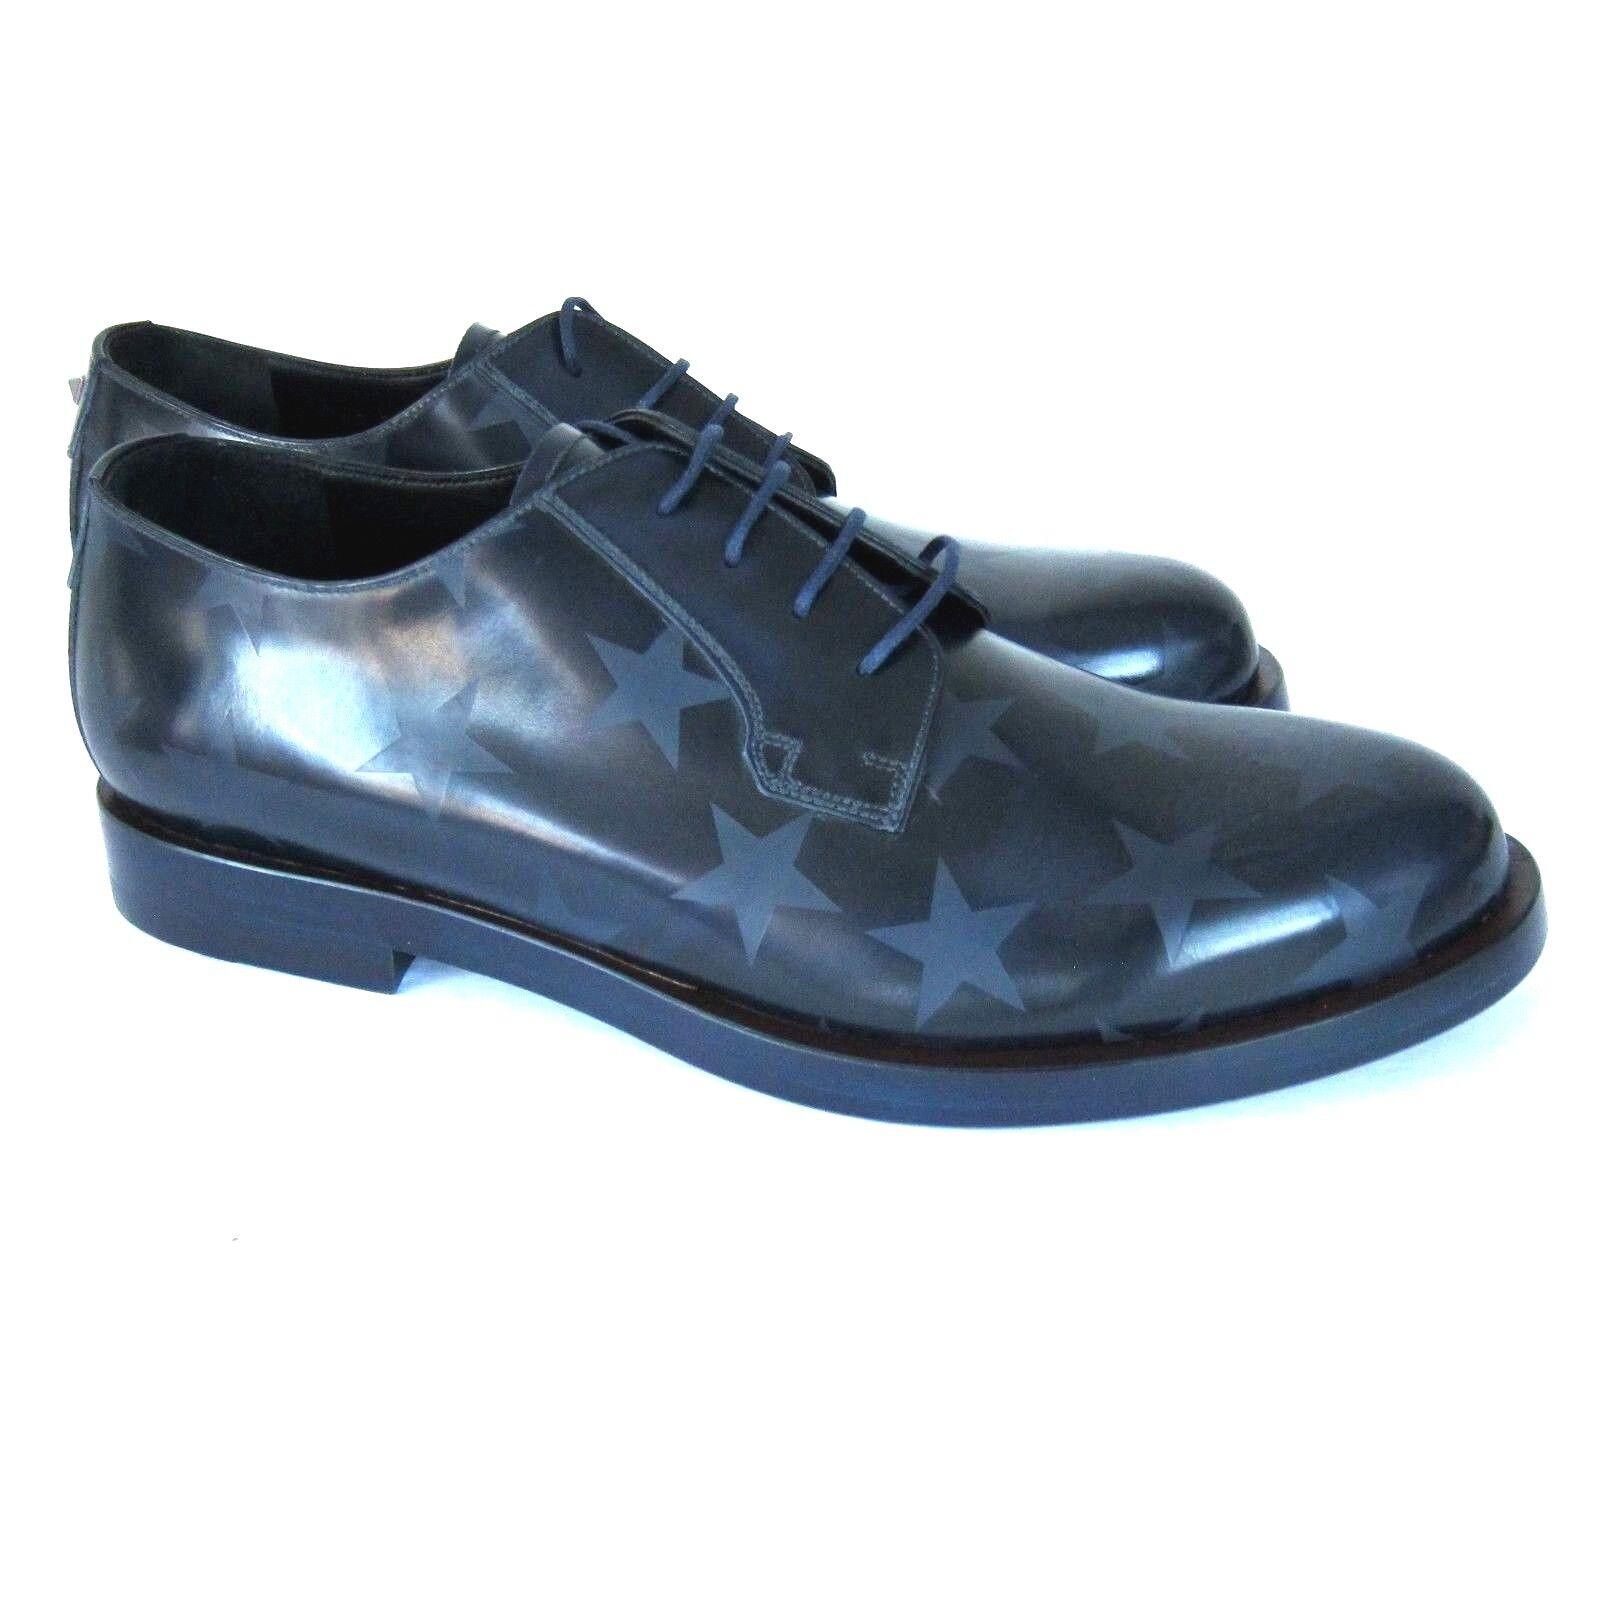 J-2854263 New Valentino Garavani bluee Embossed Star Lace shoes Size 43.5 US 10.5